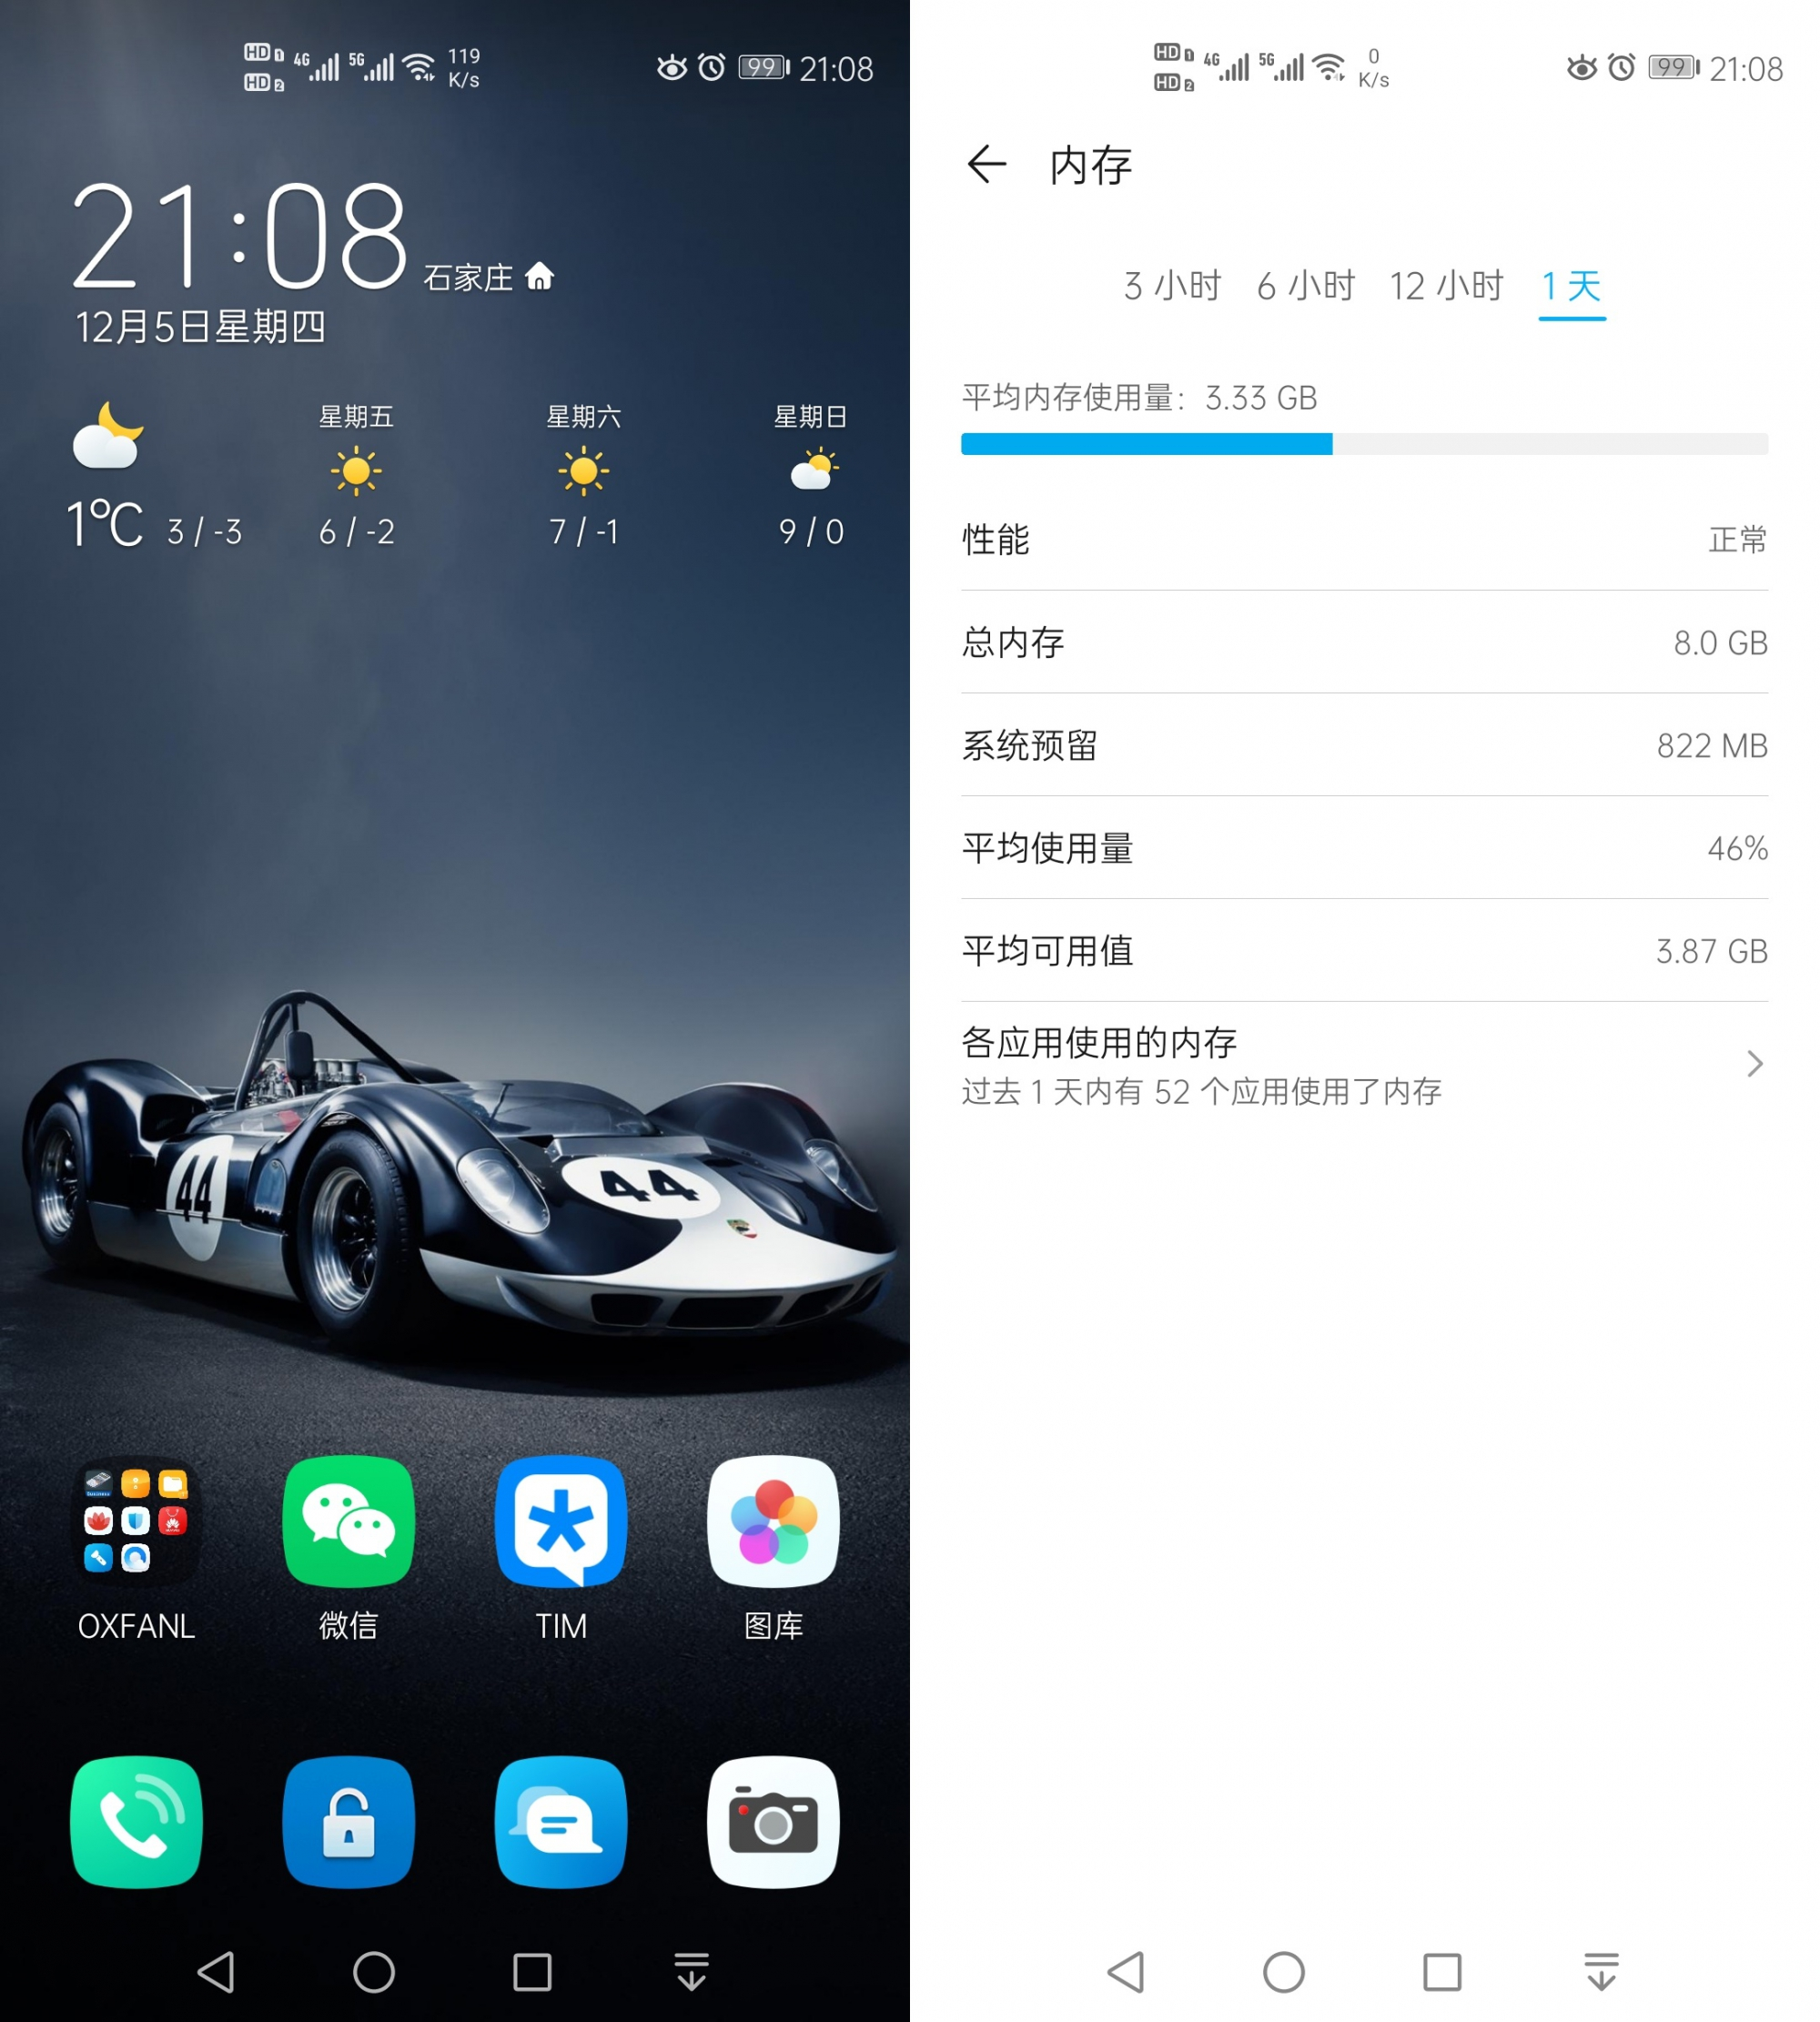 Screenshot_20191205_210852_com.huawei.android.lau.jpg